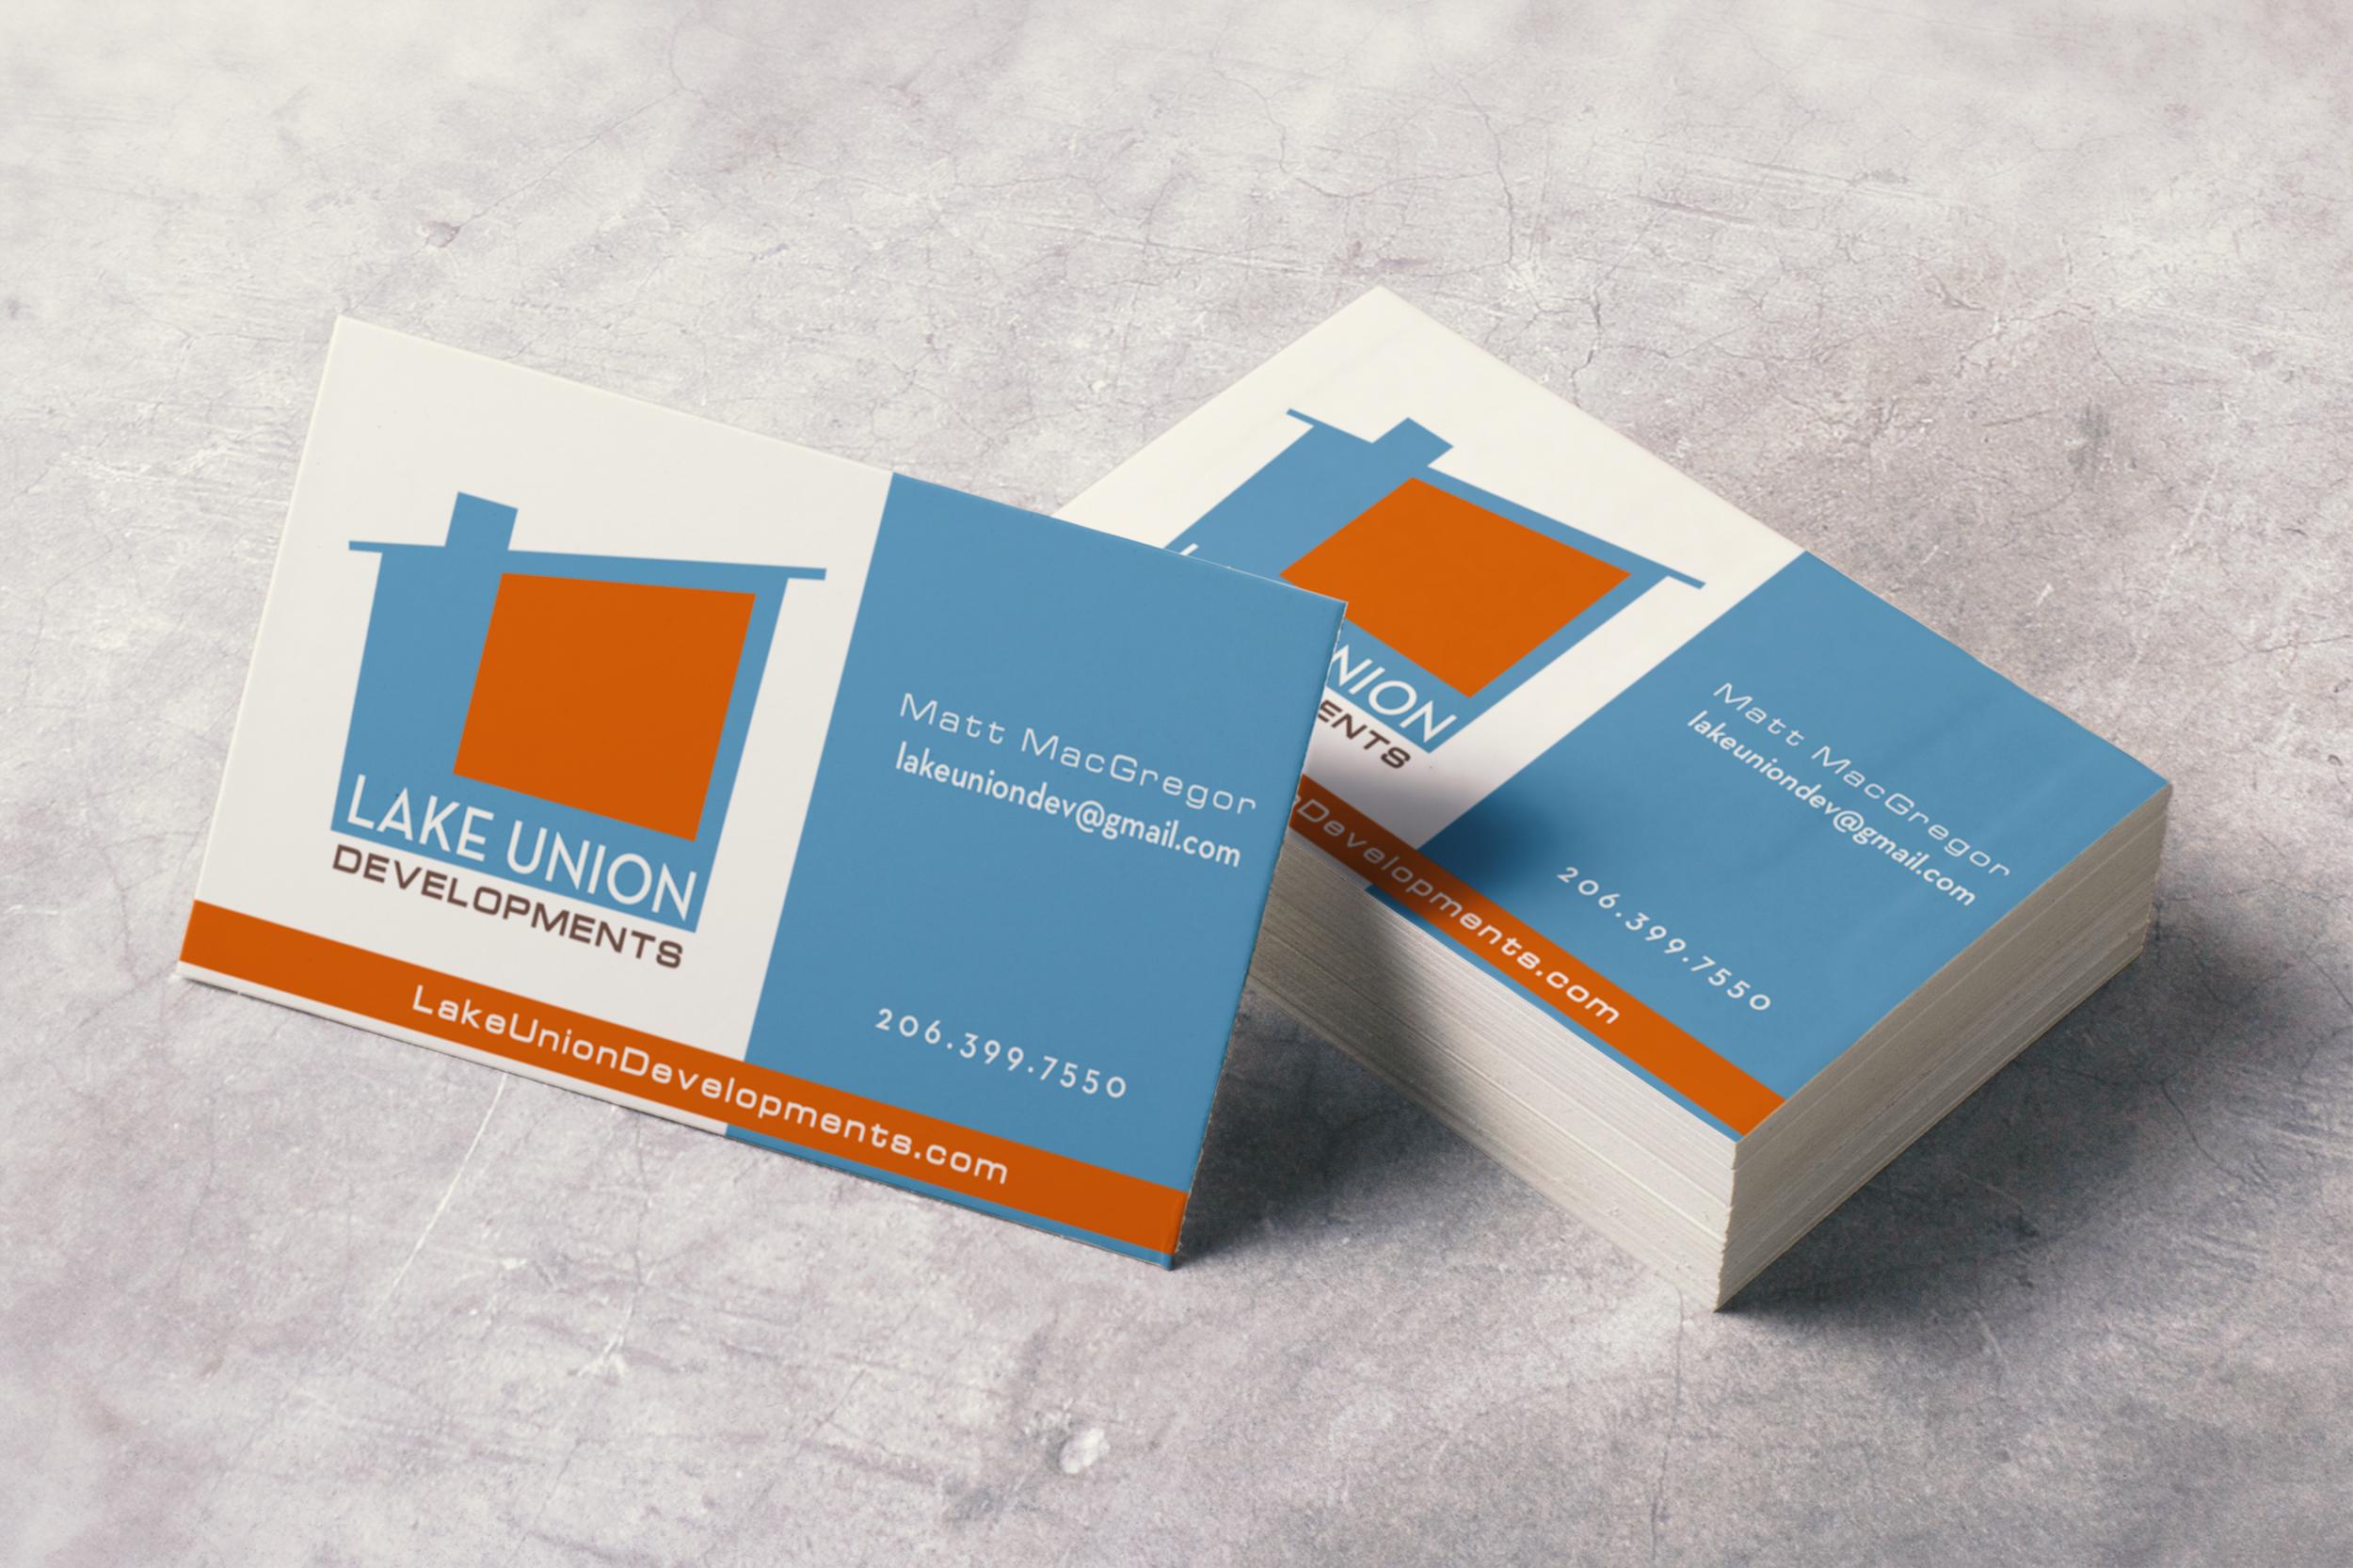 Lake union developments hi octane design environmental for Union business cards